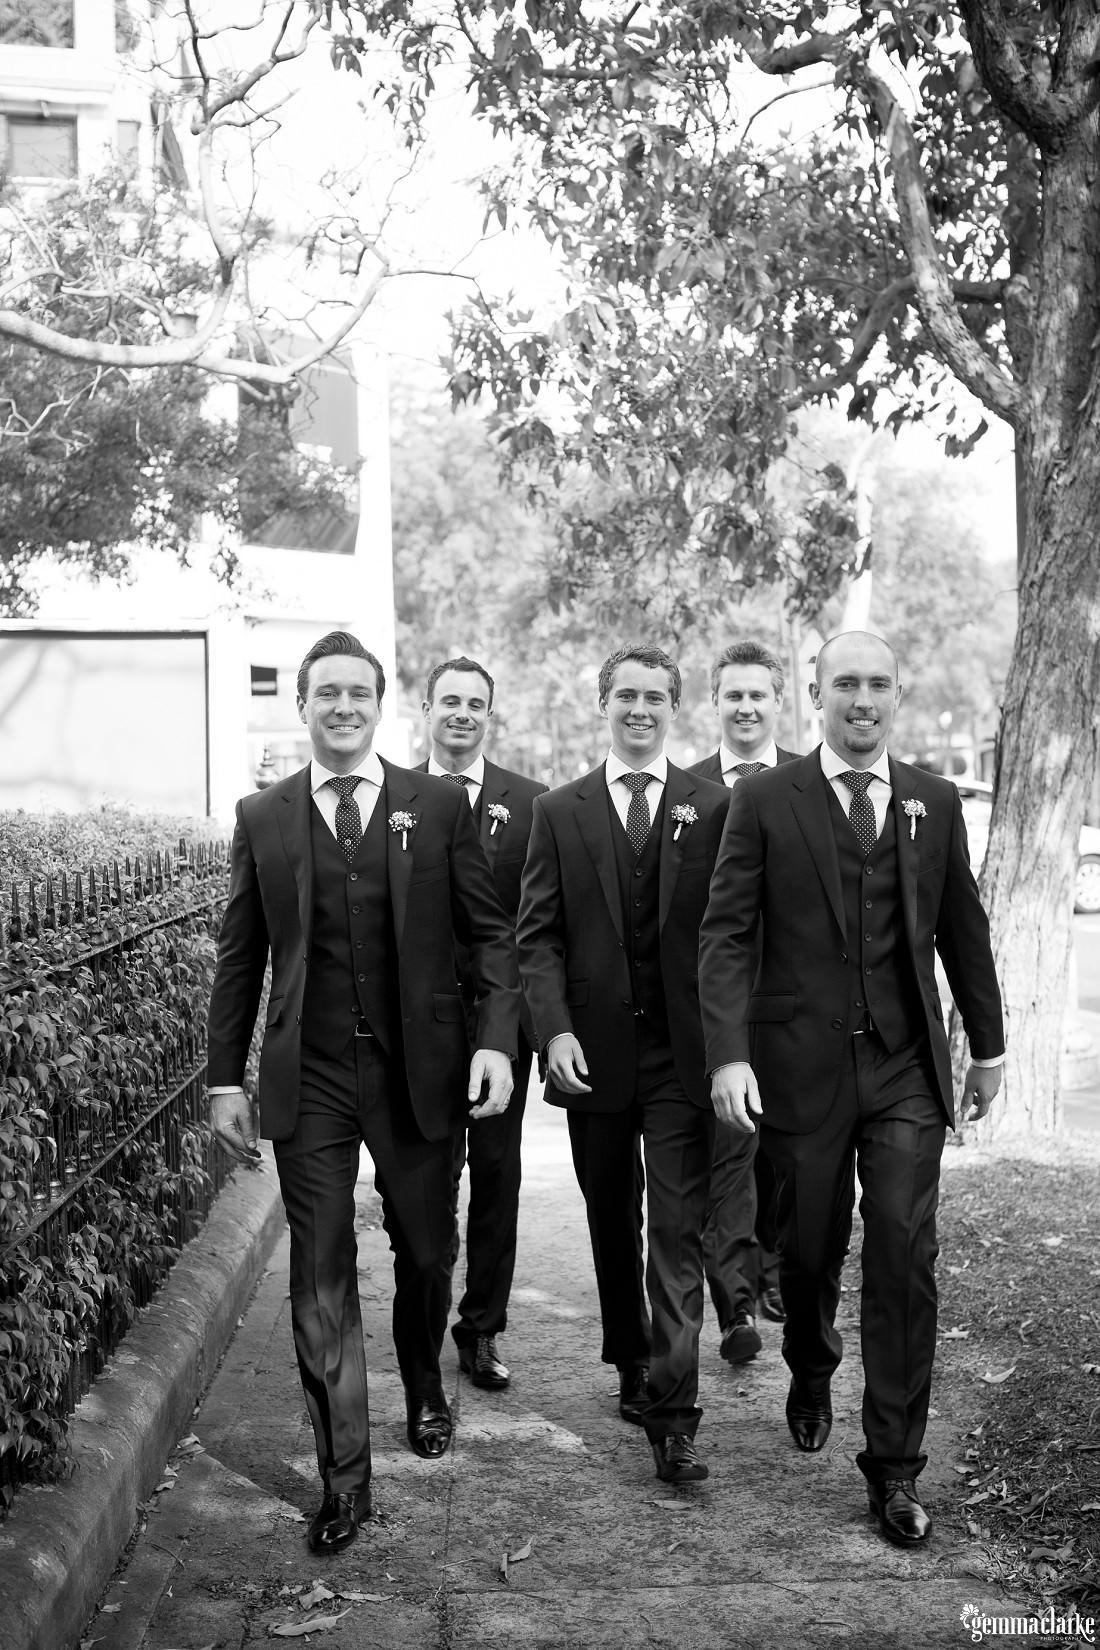 gemma-clarke-photography_watsons-bay-wedding_dog-bridesmaid_kristyl-and-ben_0050